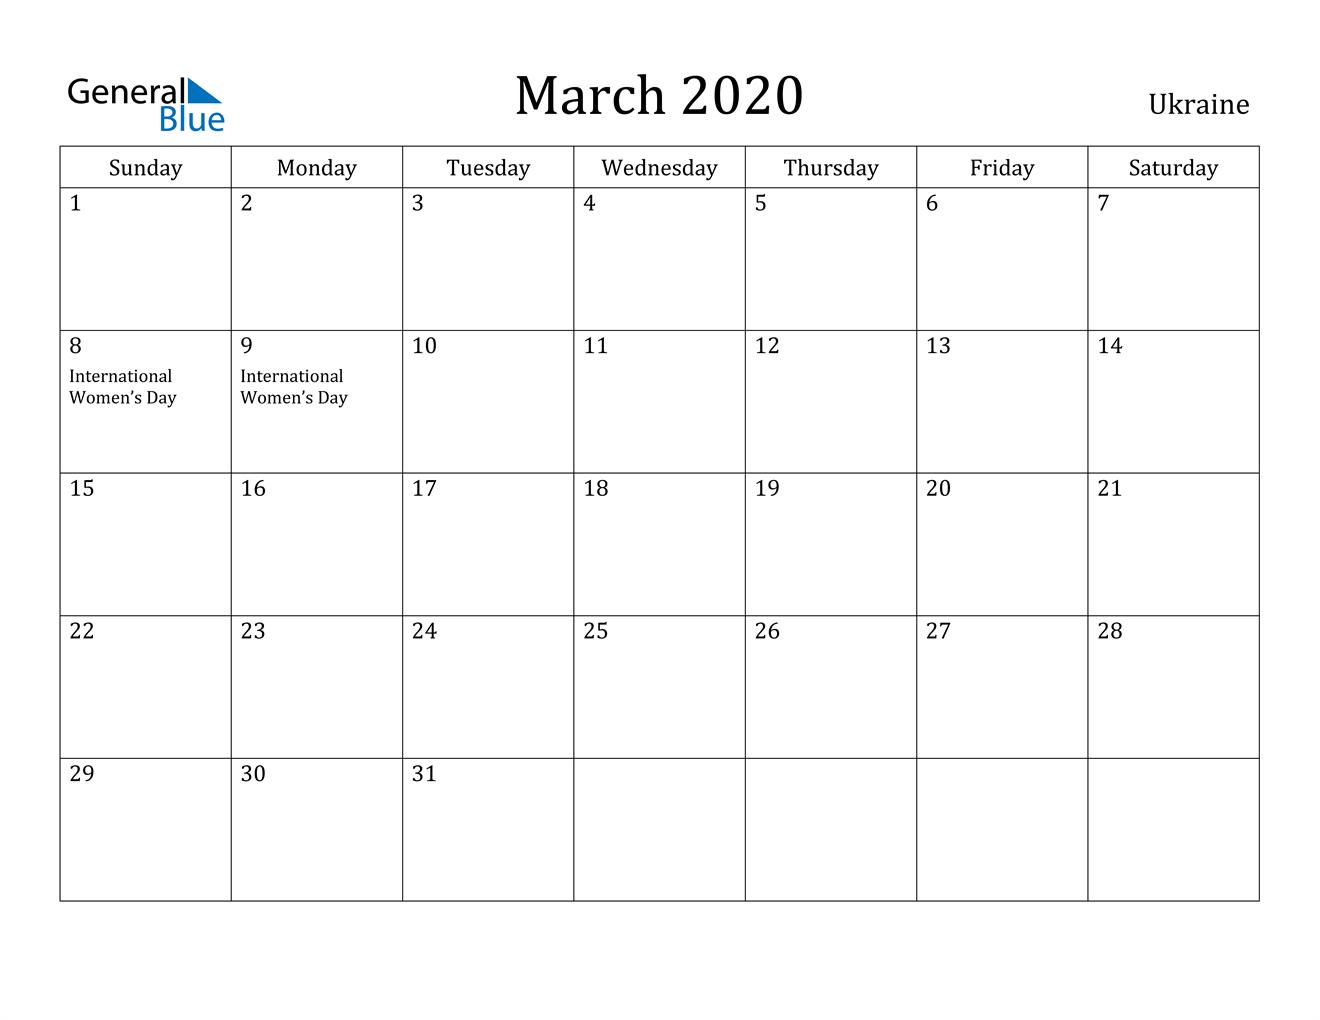 Image of March 2020 Ukraine Calendar with Holidays Calendar